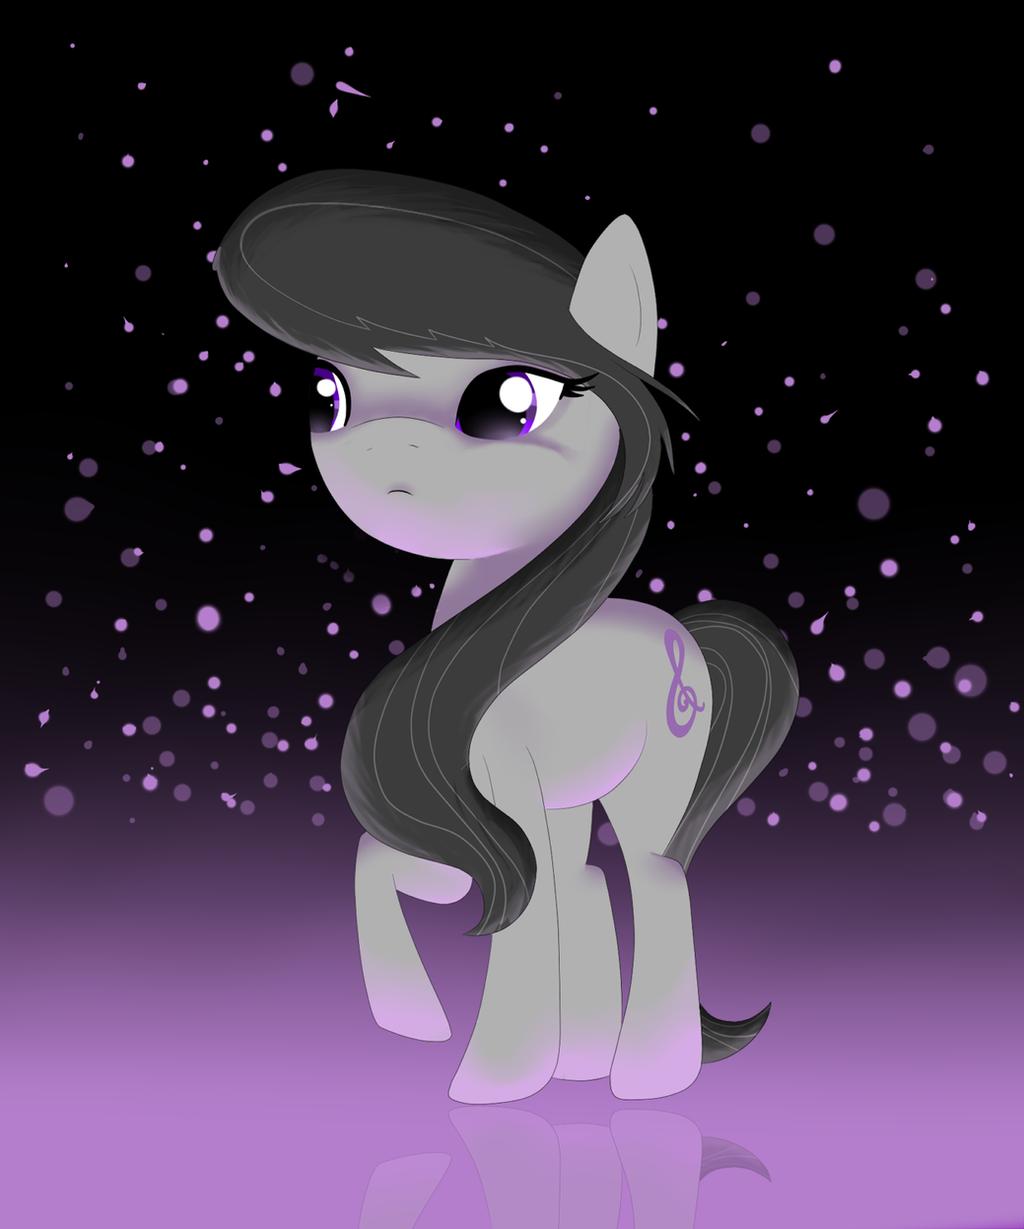 Octavia's Ballad by ZoeeZoee